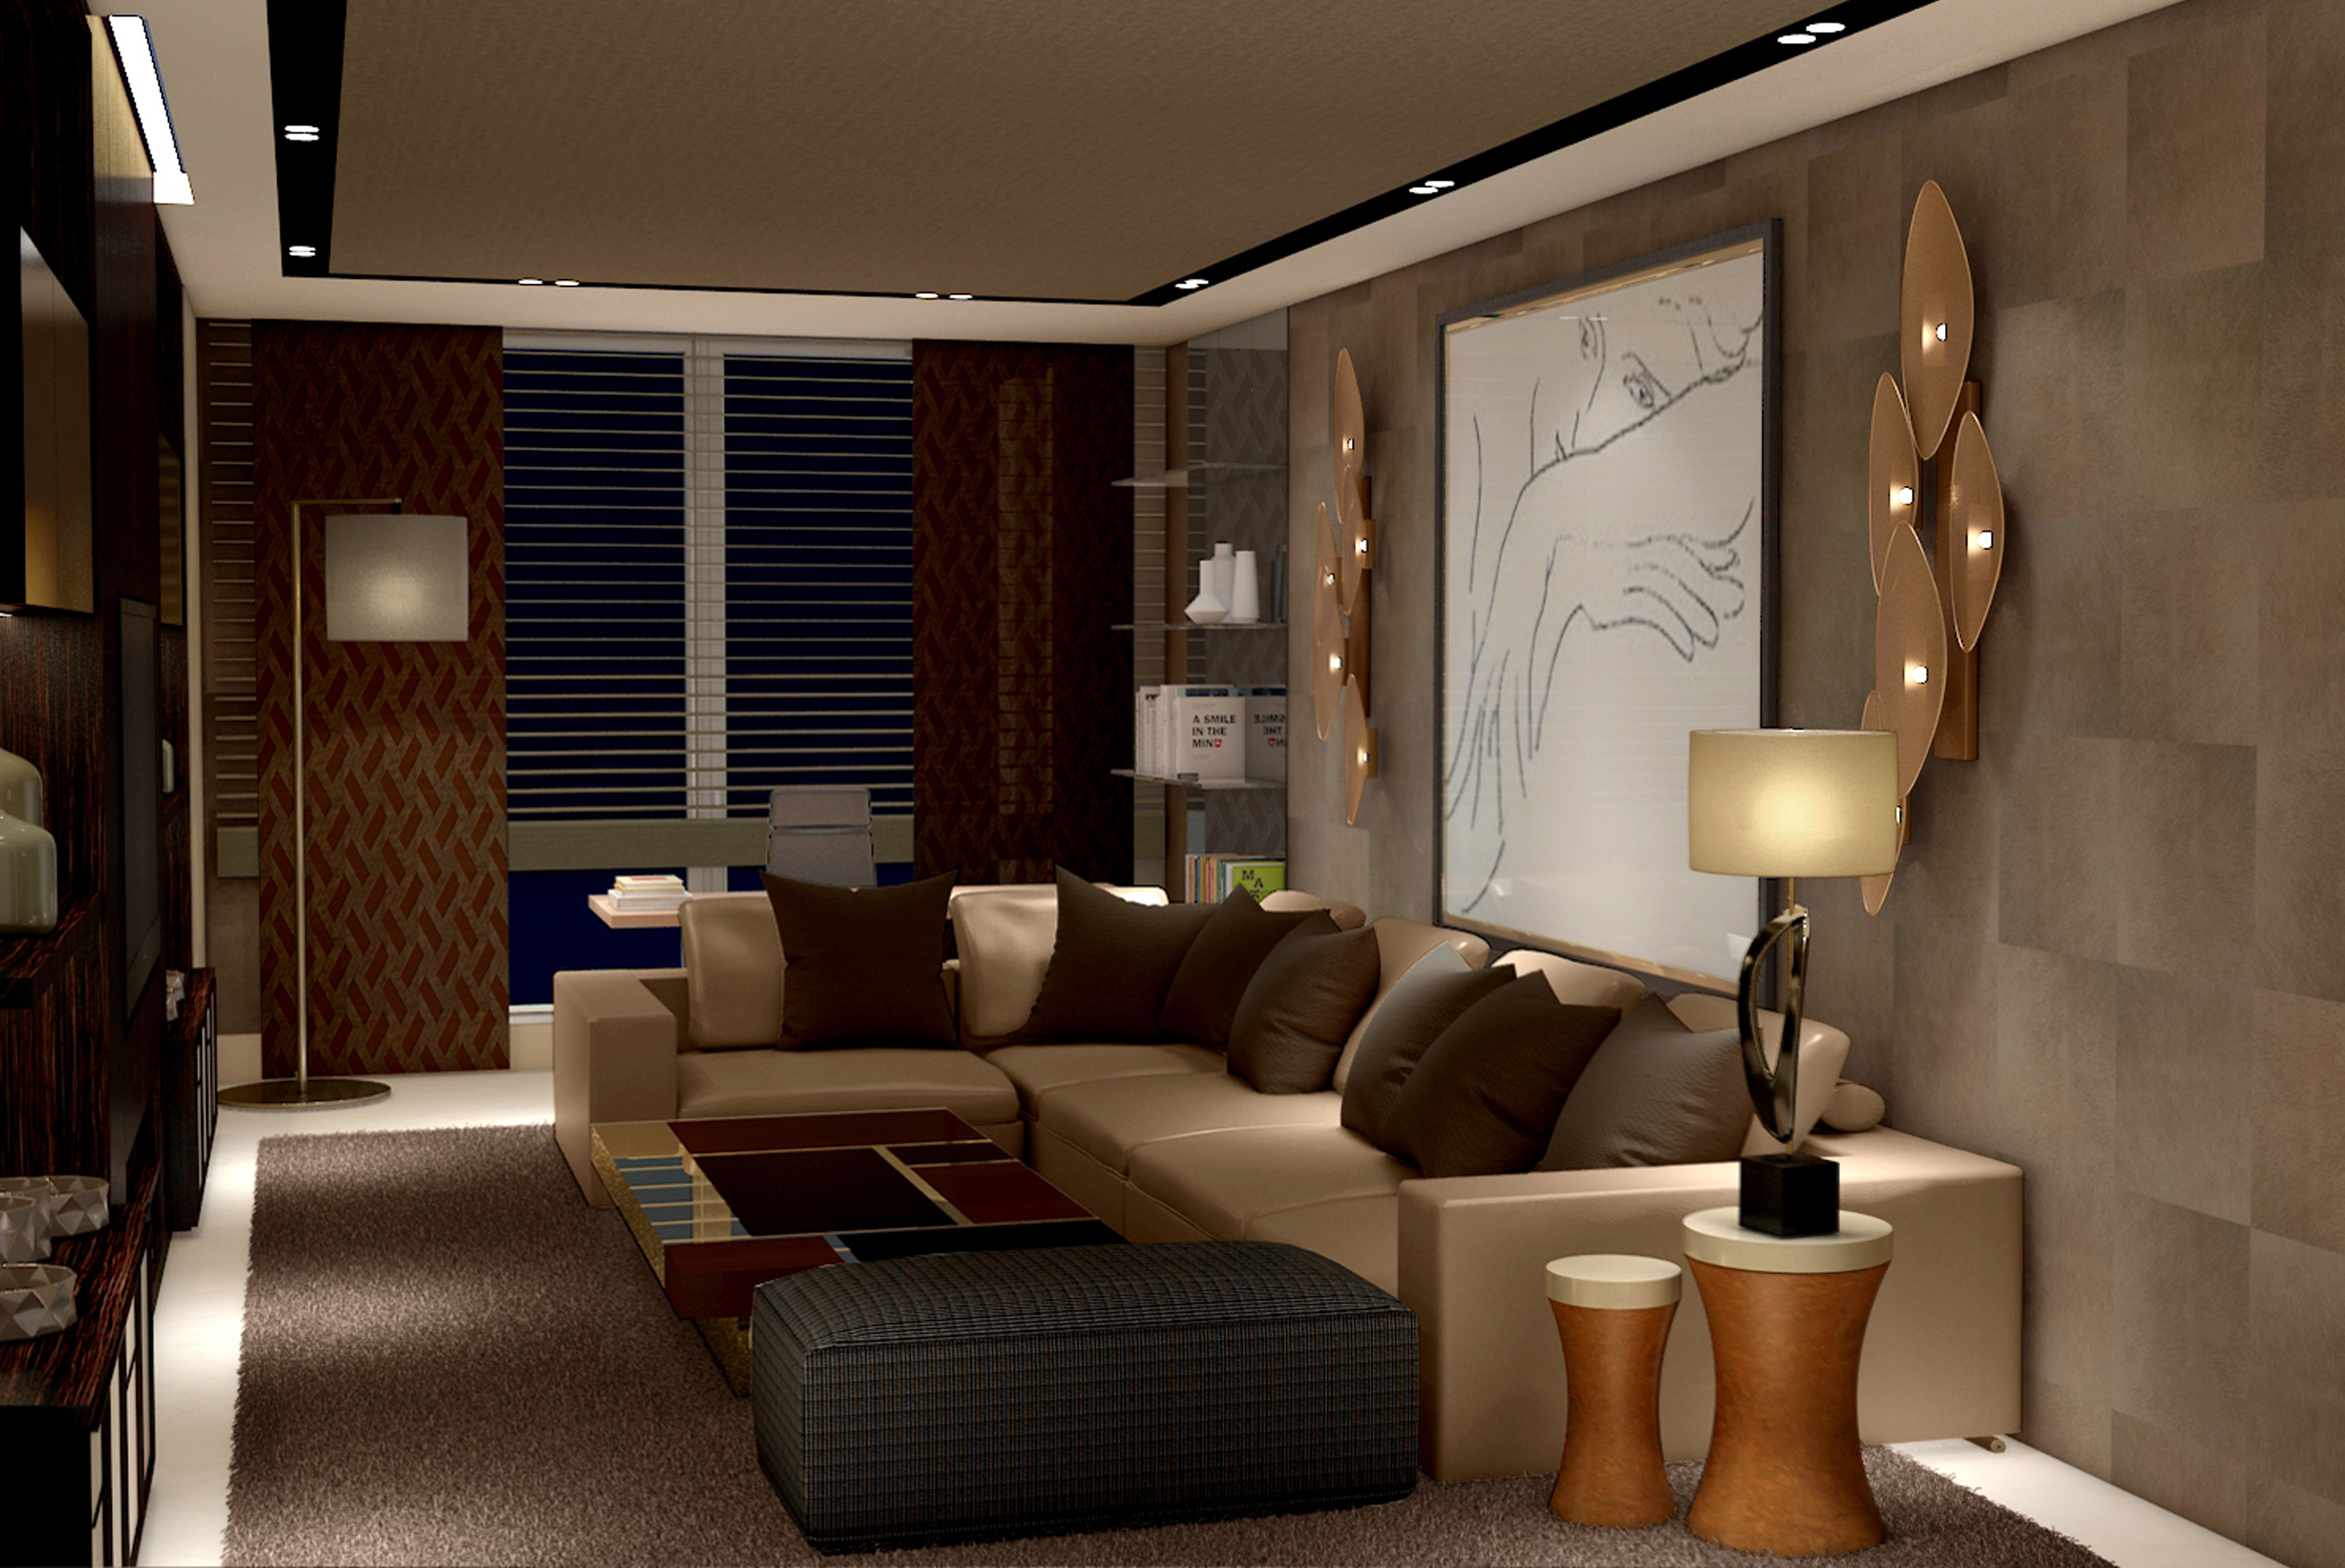 Vivienda Unifamiliar Paseo De Los Lagos 1 La Finca Viana Design # Muebles Viana Salas